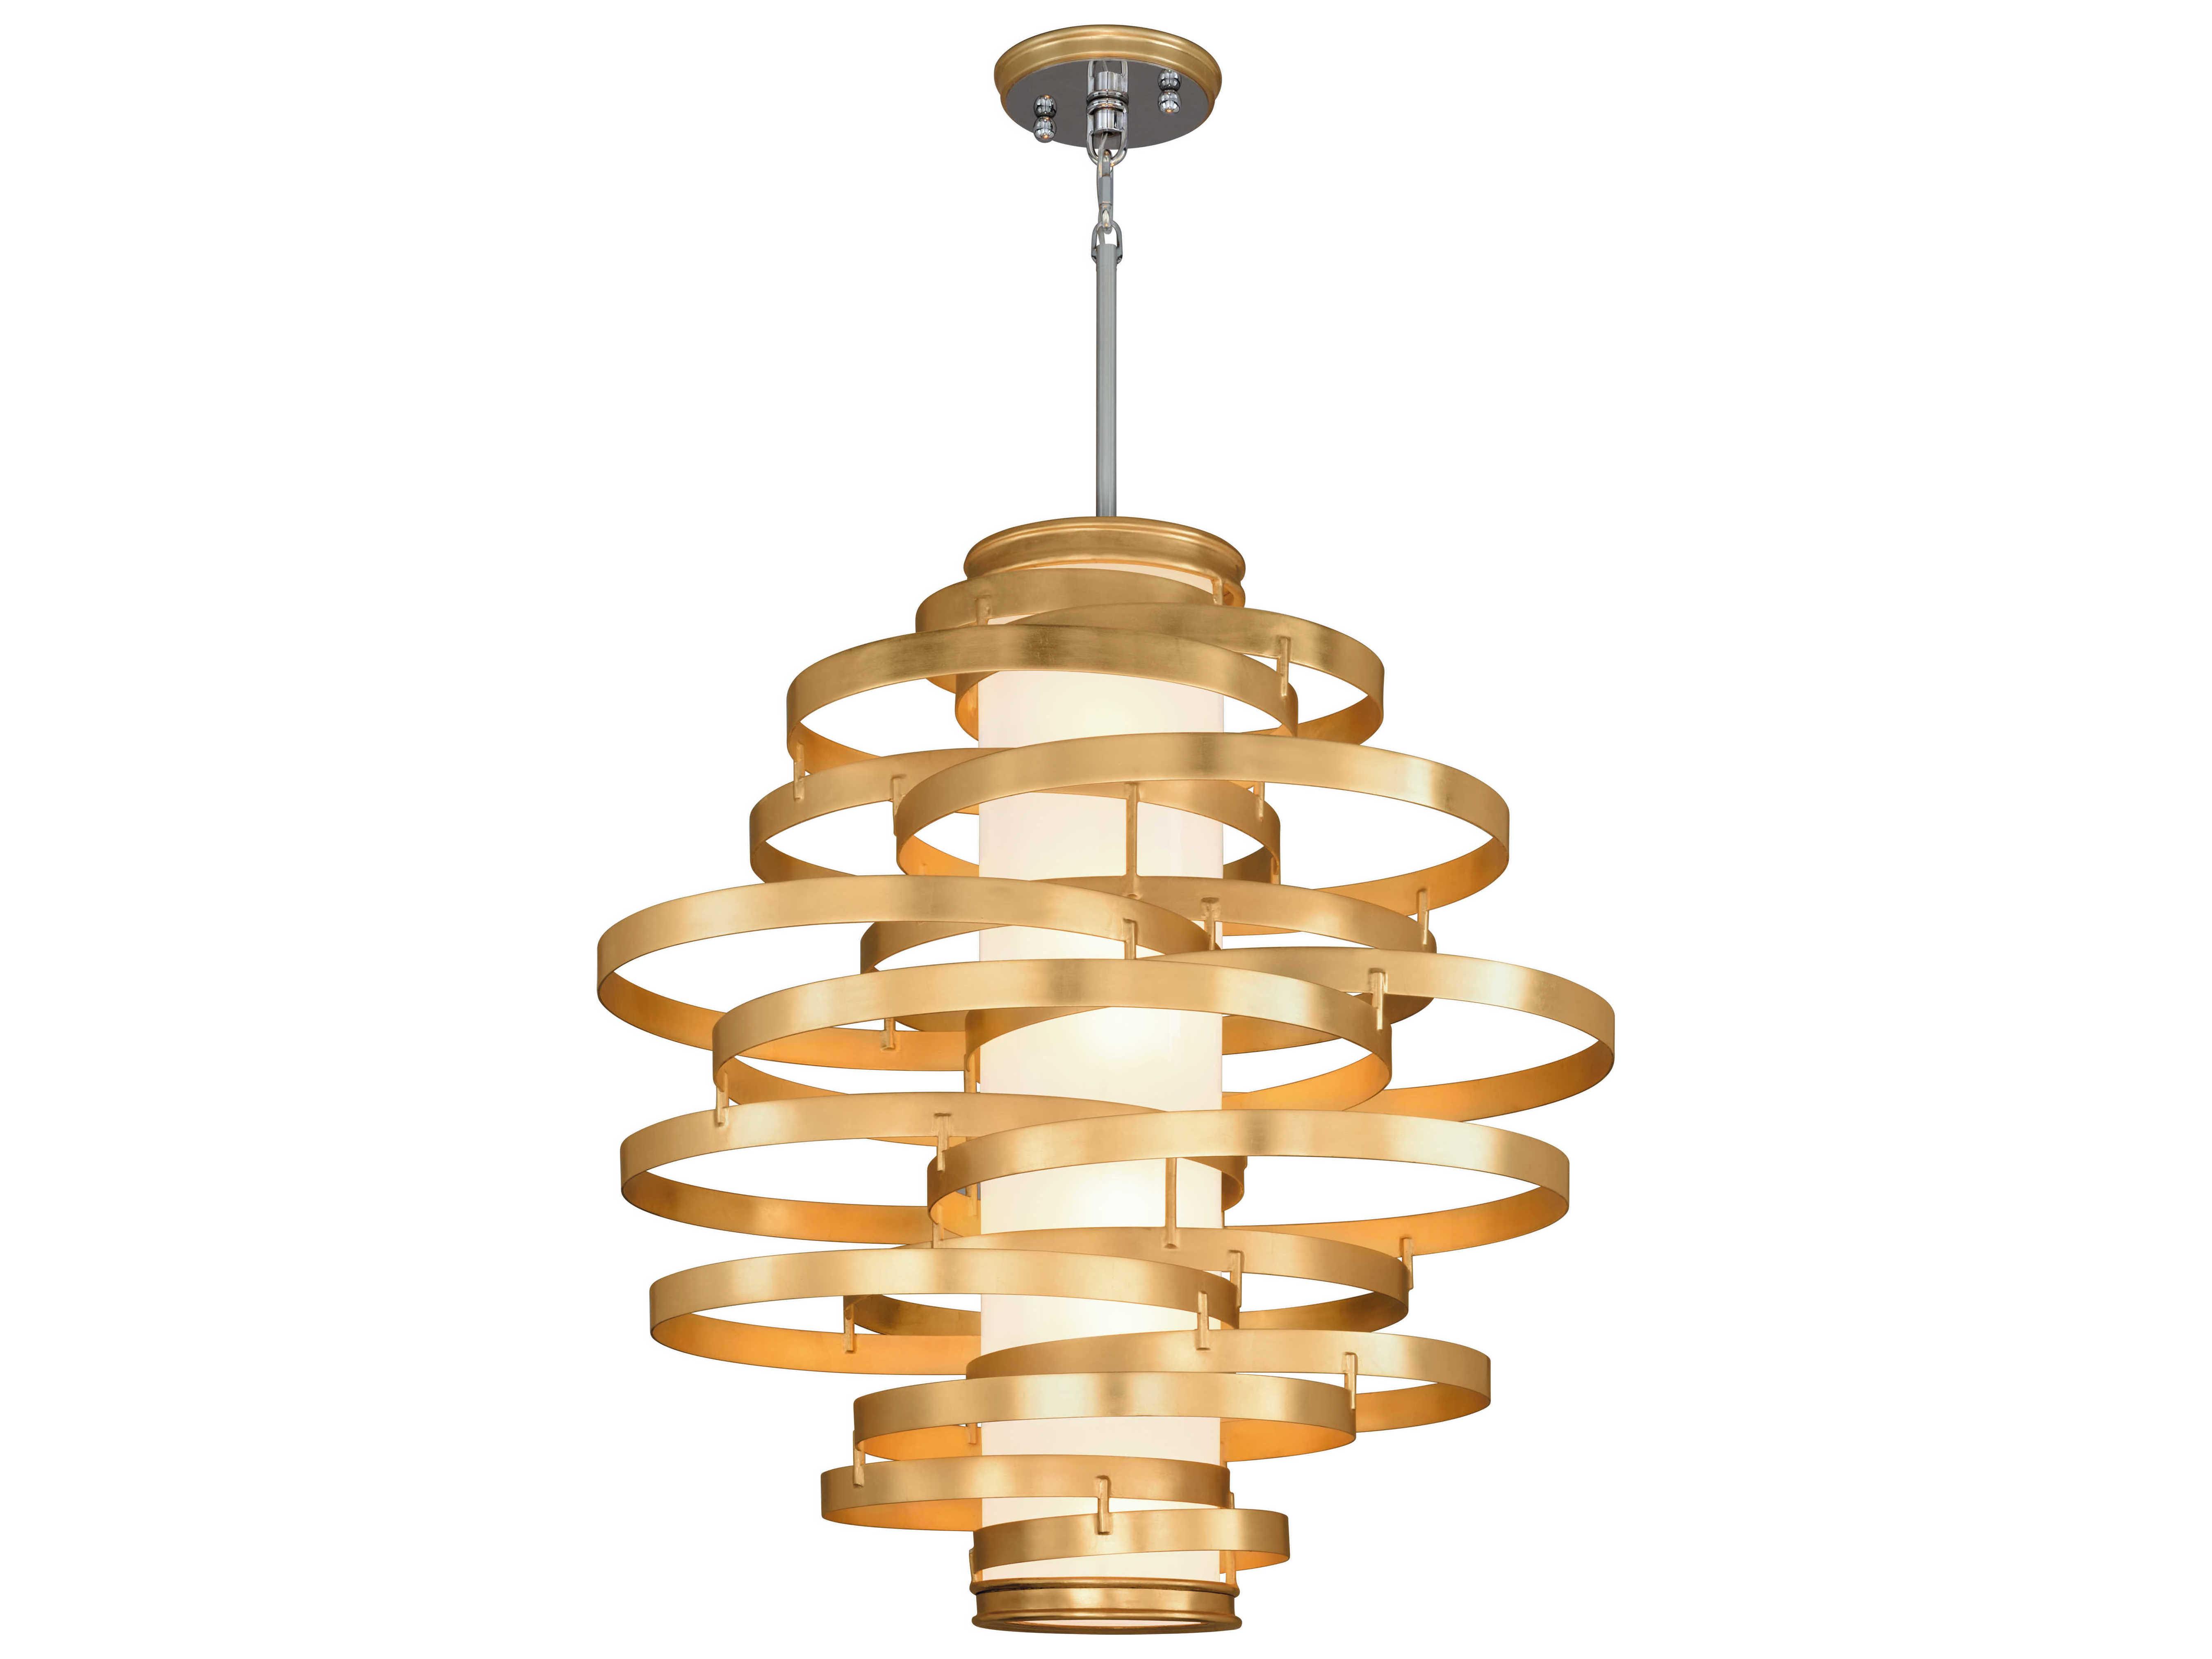 Corbett Lighting Vertigo Gold Leaf